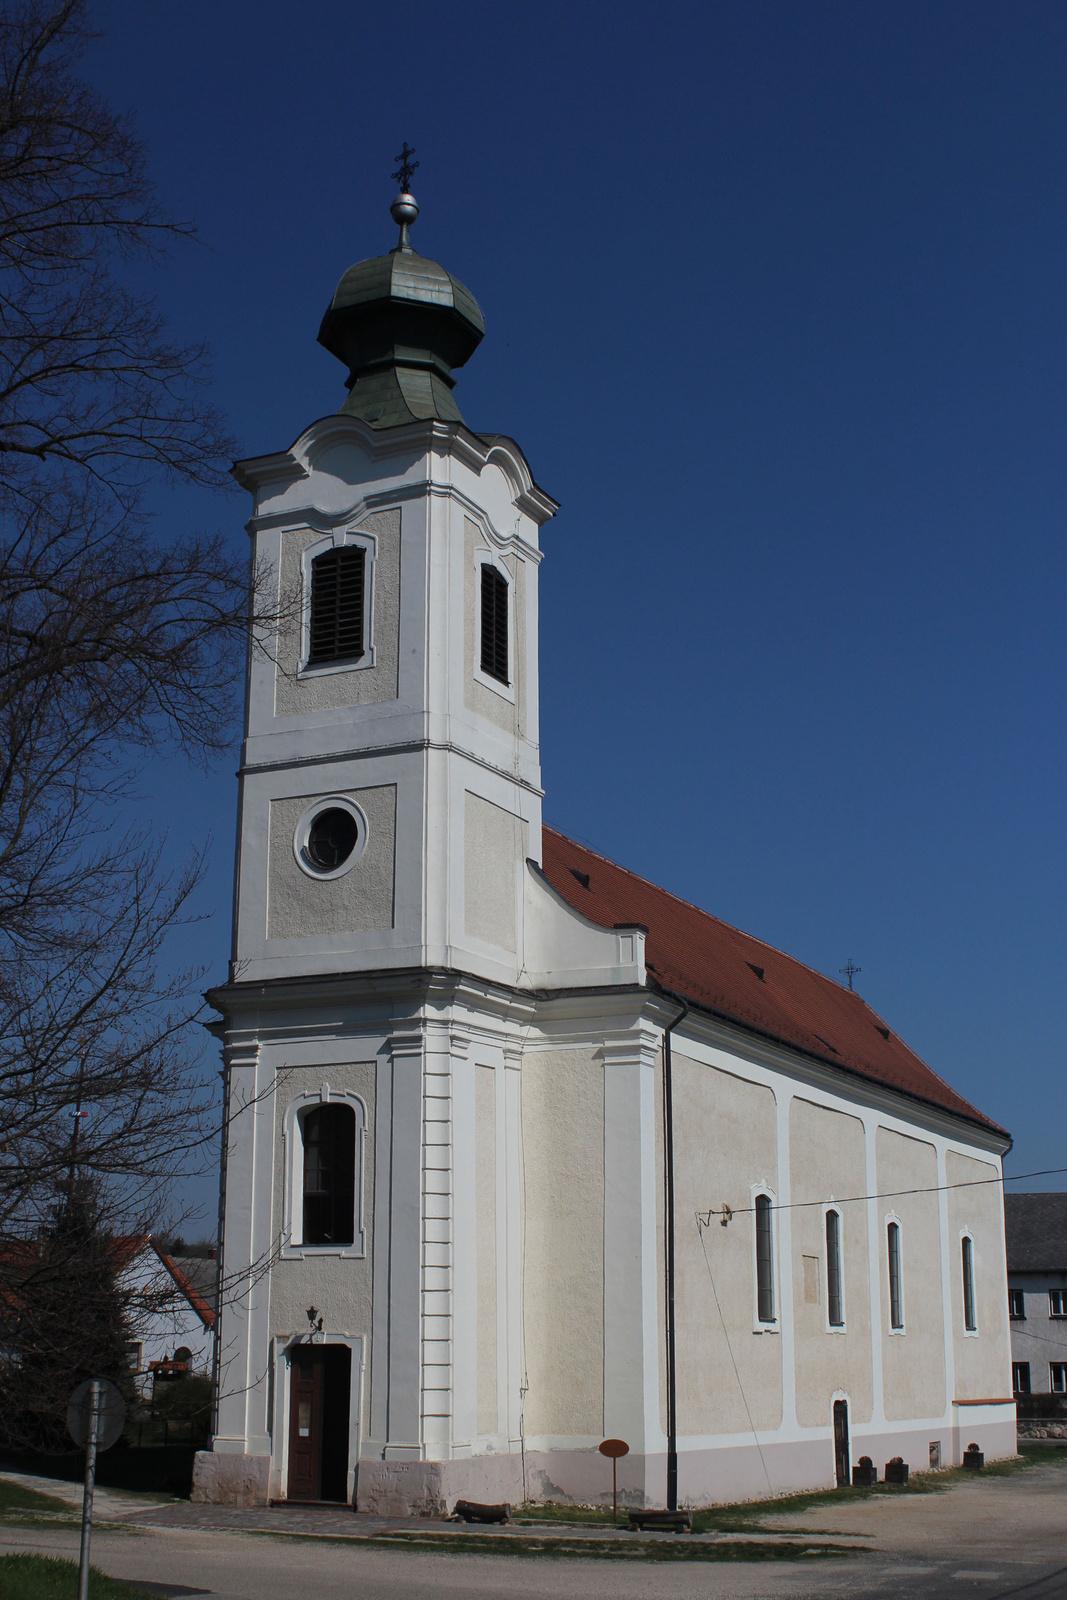 fovarosi.blog.hu: 20170402-85-Varoslod-RomKatTemplom - indafoto.hu